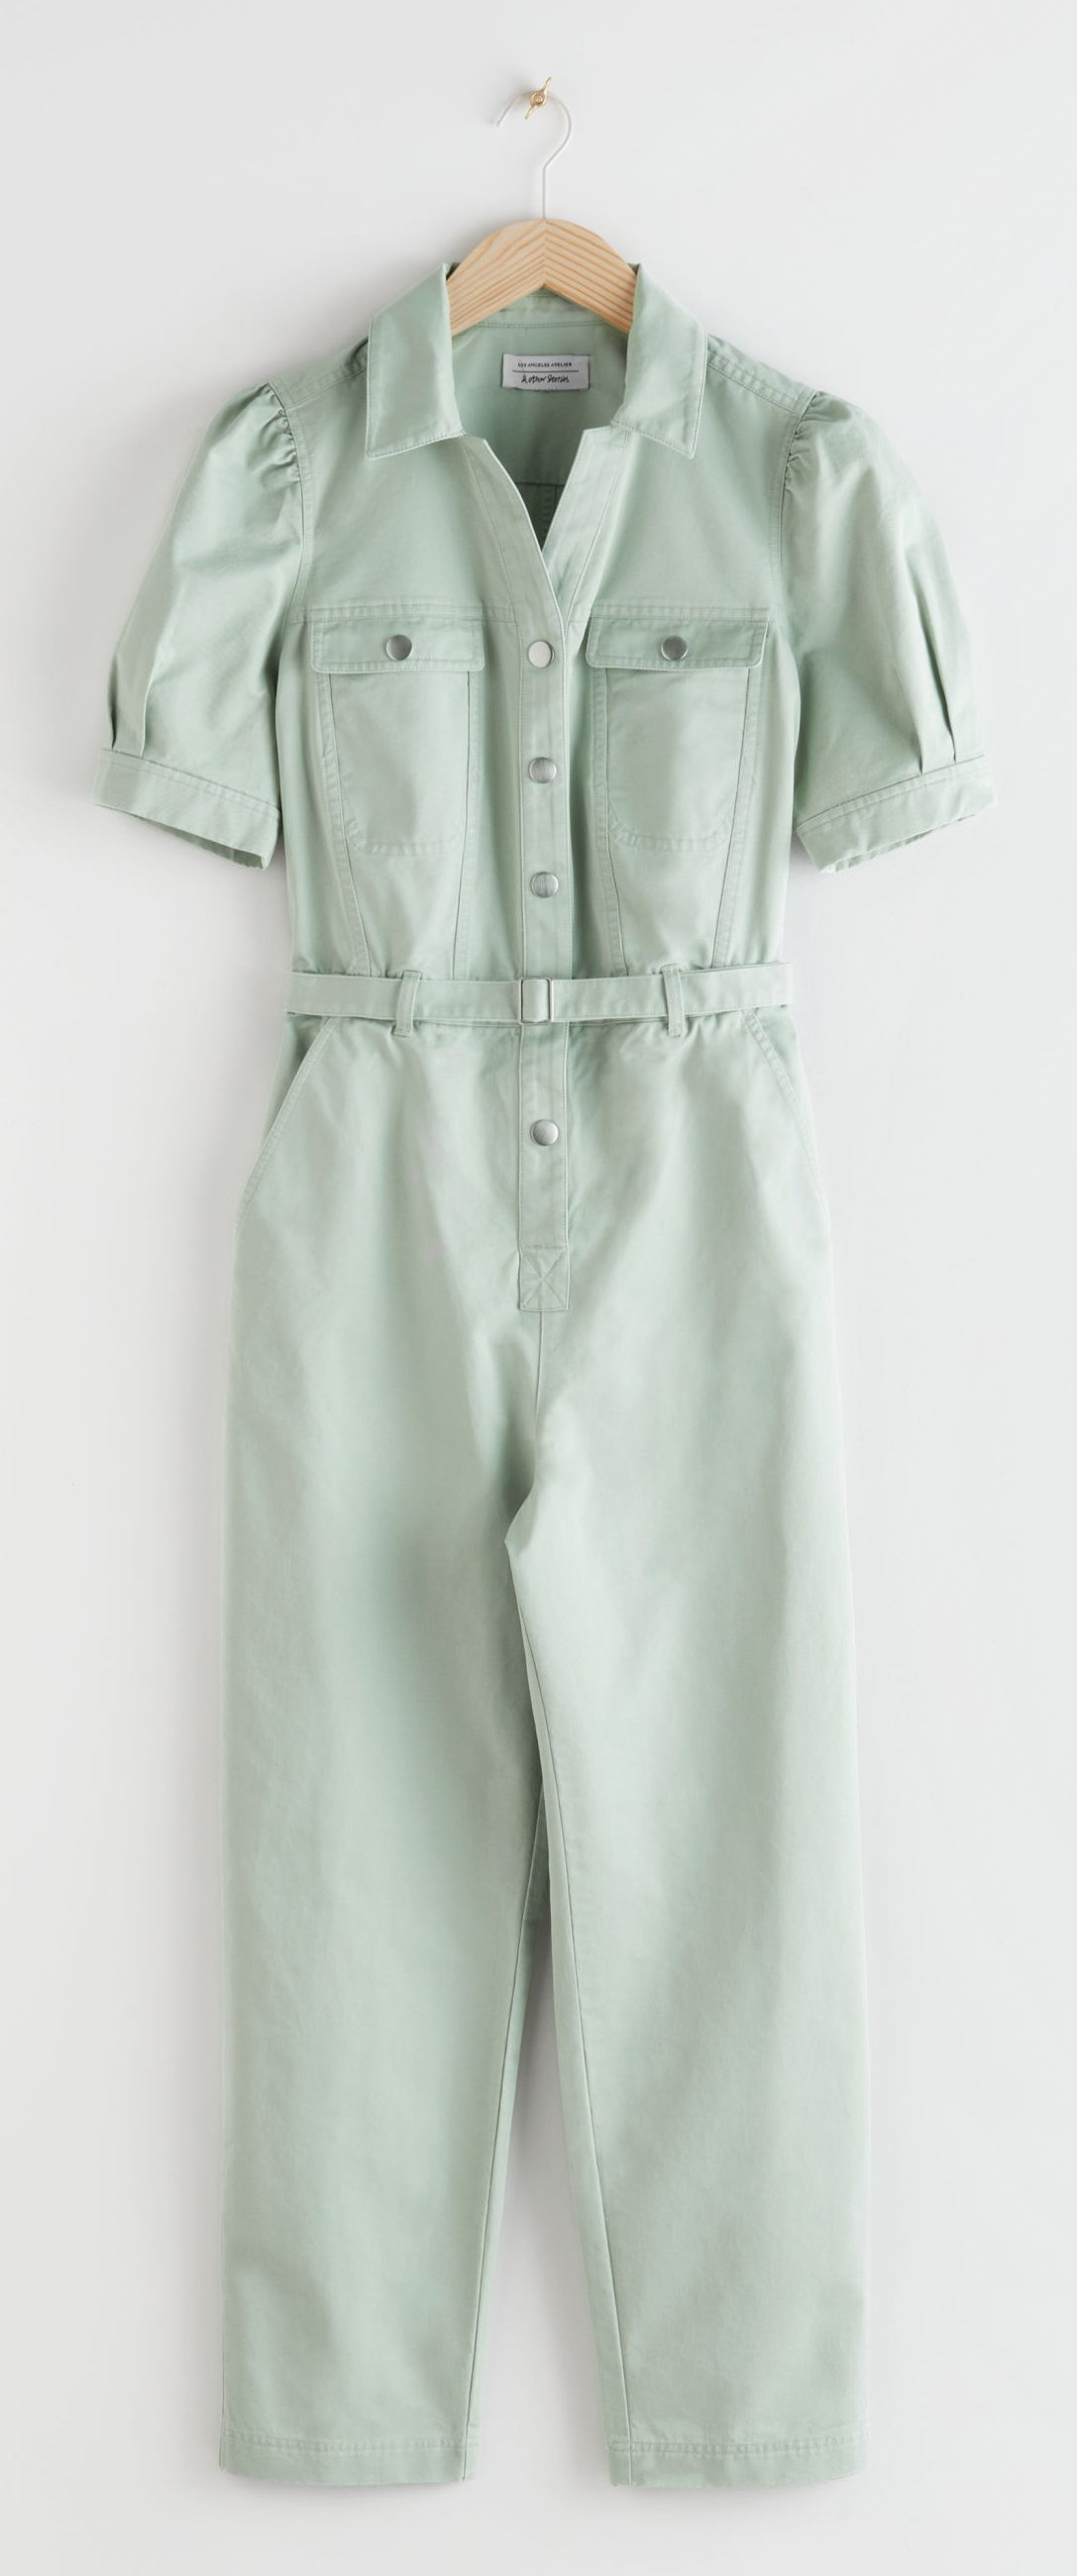 Denim buksedragt, mintgrøn. Foto: PR)